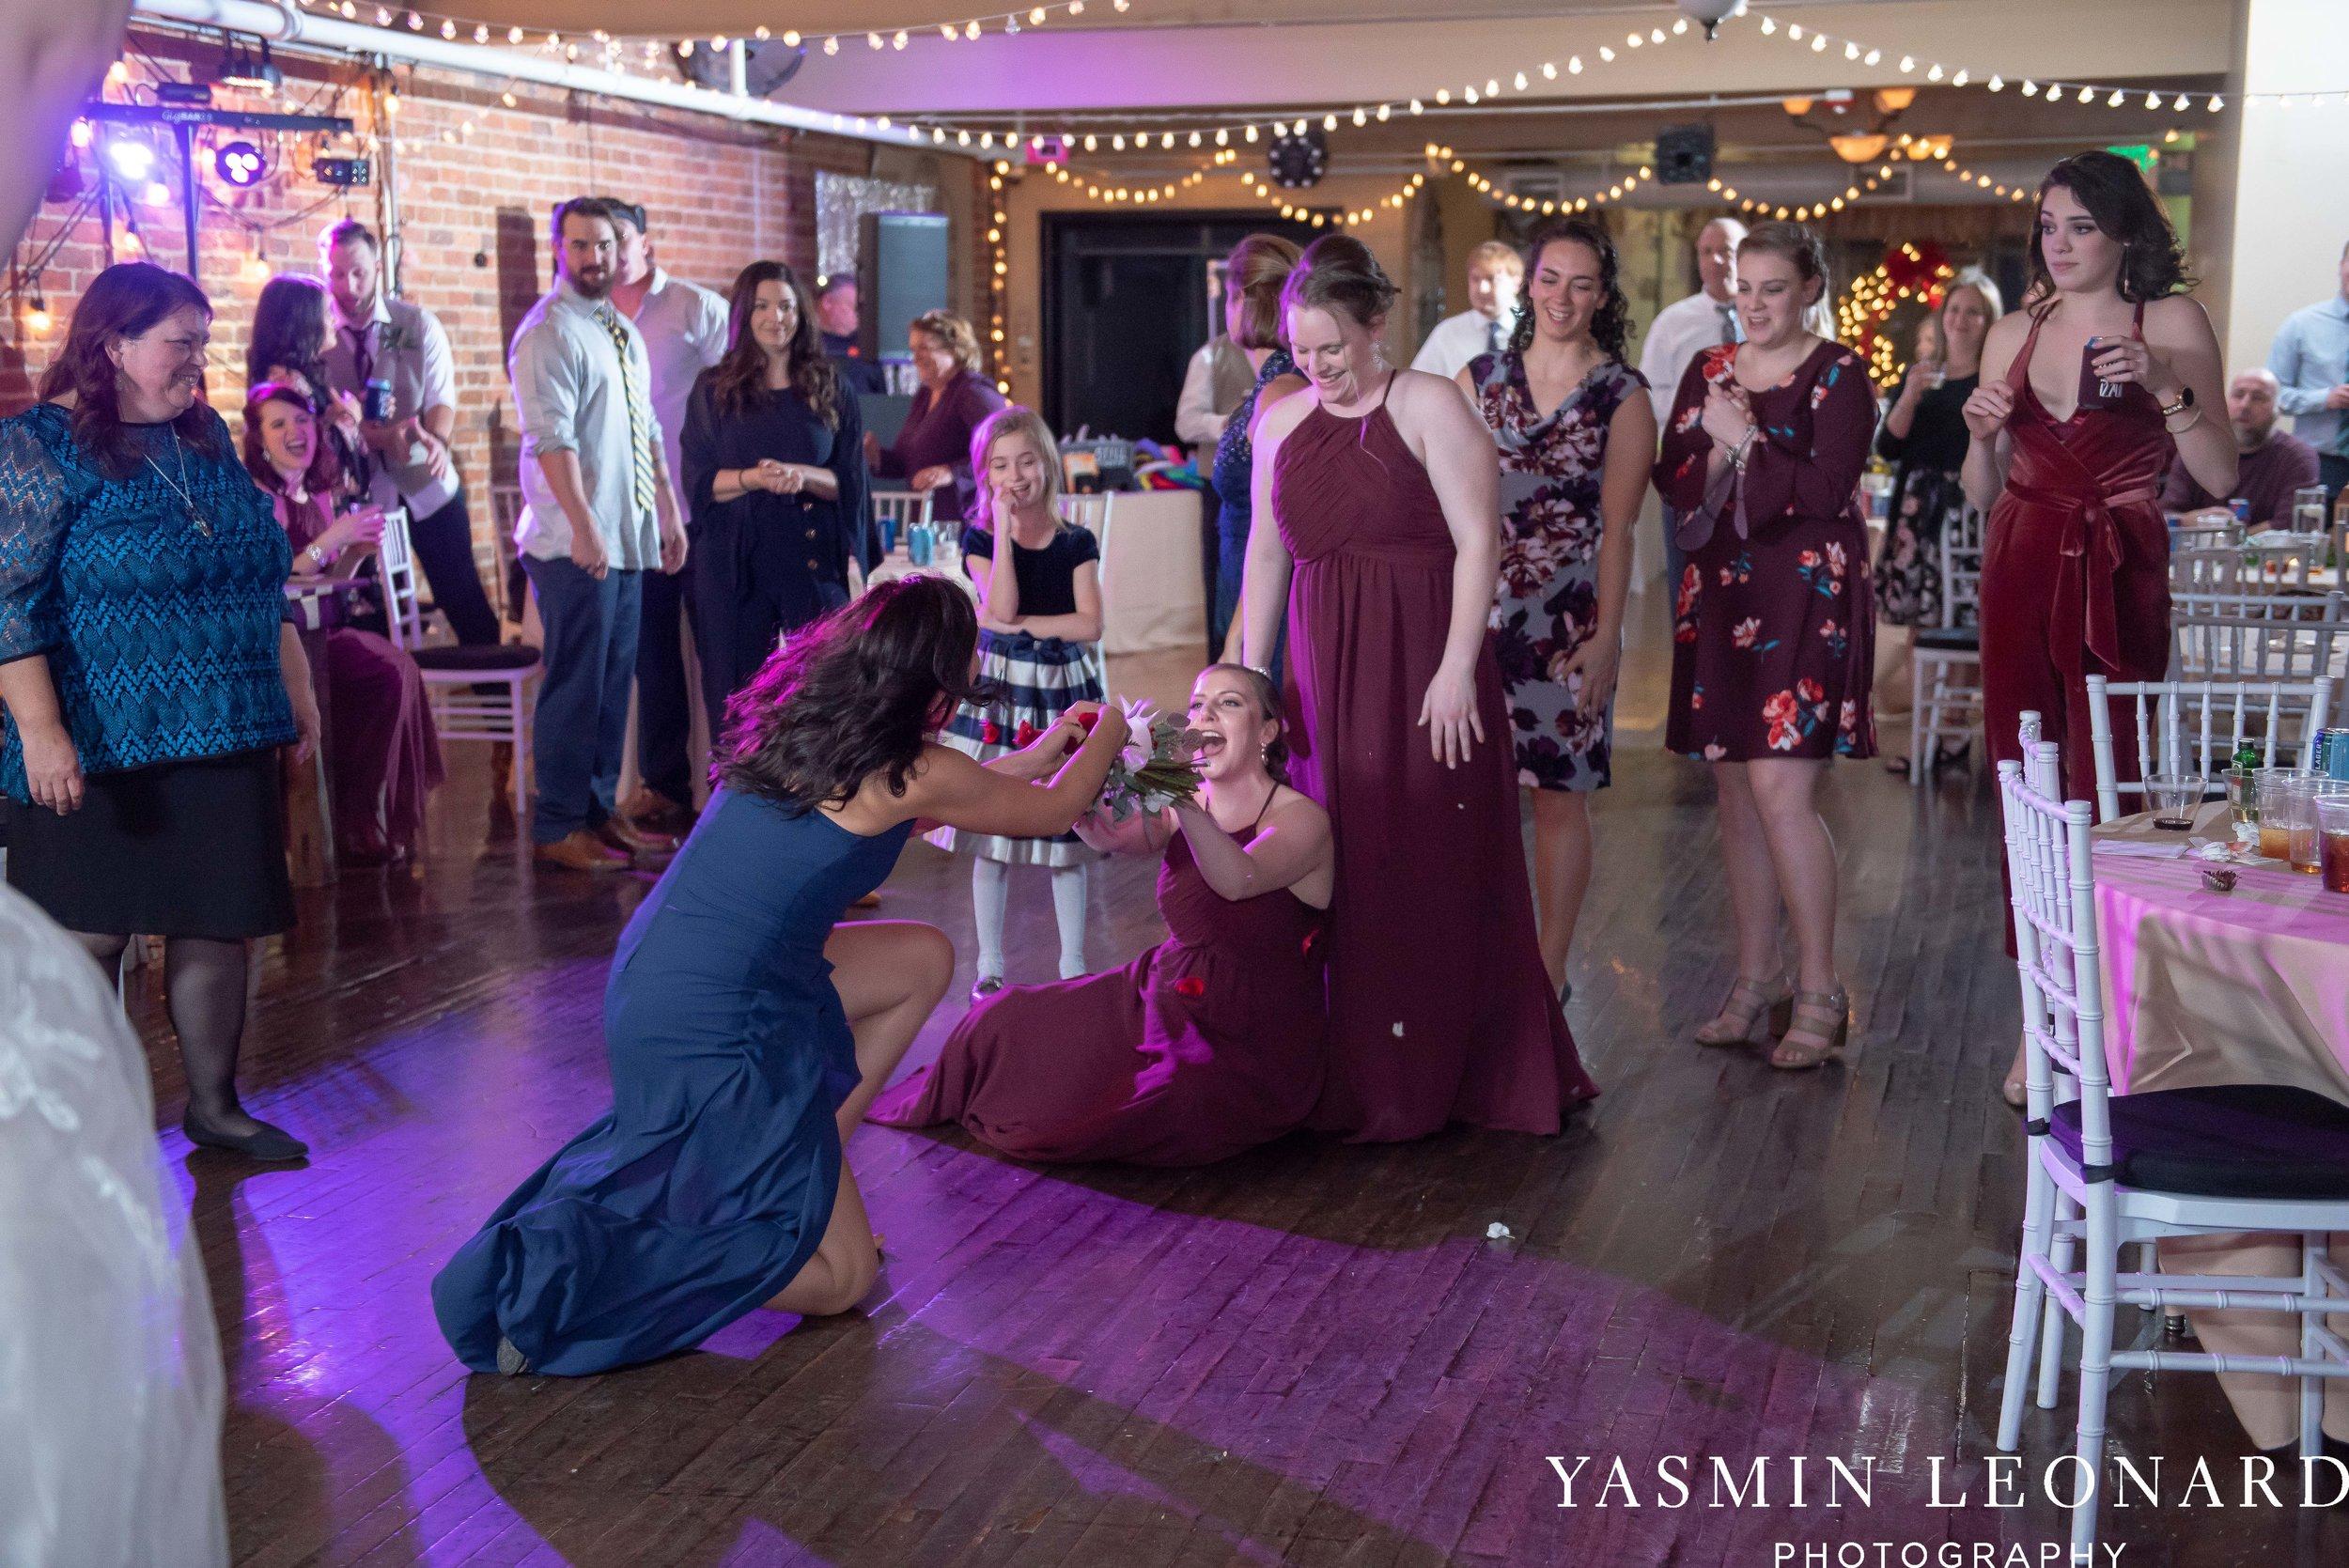 Rebekah and Matt - 105 Worth Event Centre - Yasmin Leonard Photography - Asheboro Wedding - NC Wedding - High Point Weddings - Triad Weddings - Winter Wedding-67.jpg